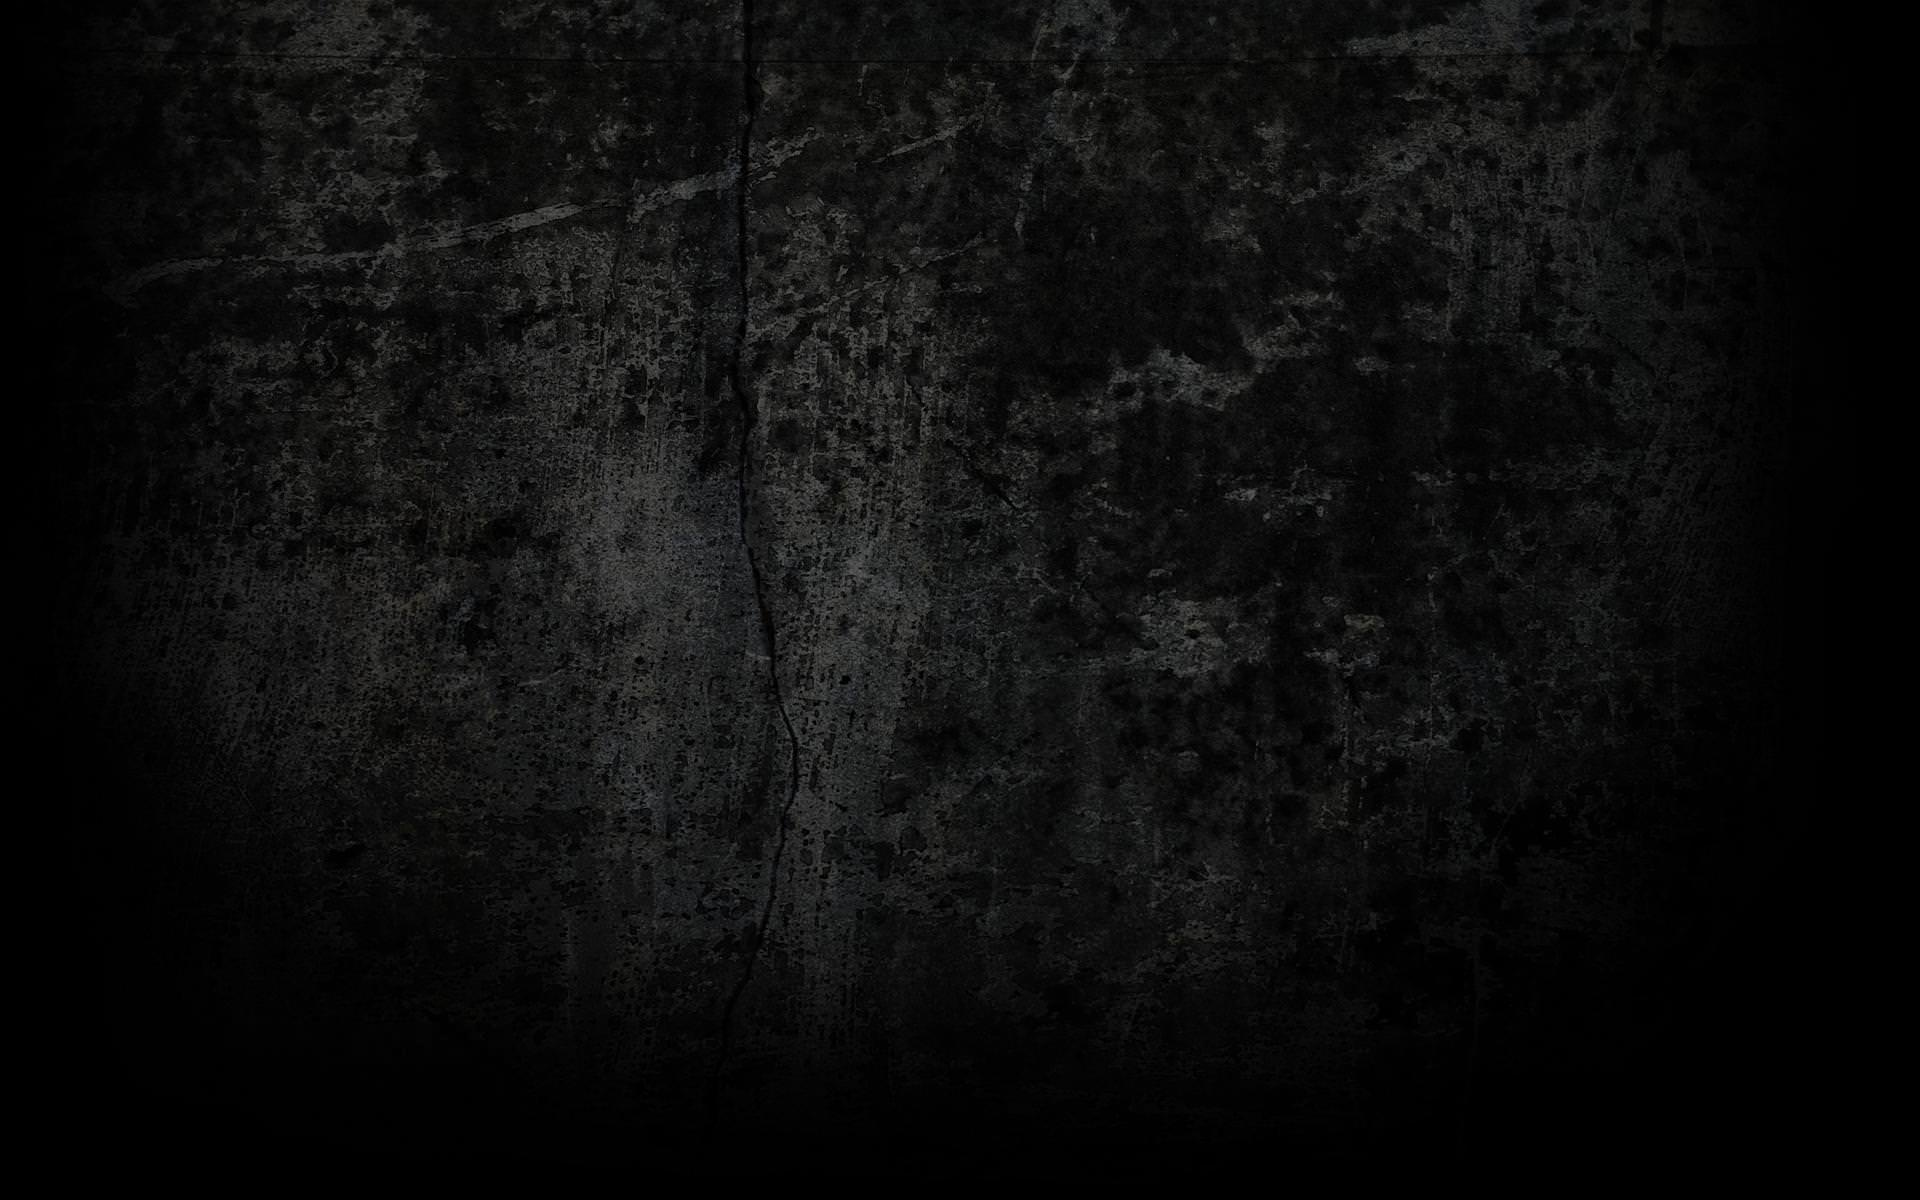 Black Grunge Wallpaper 1920x1200